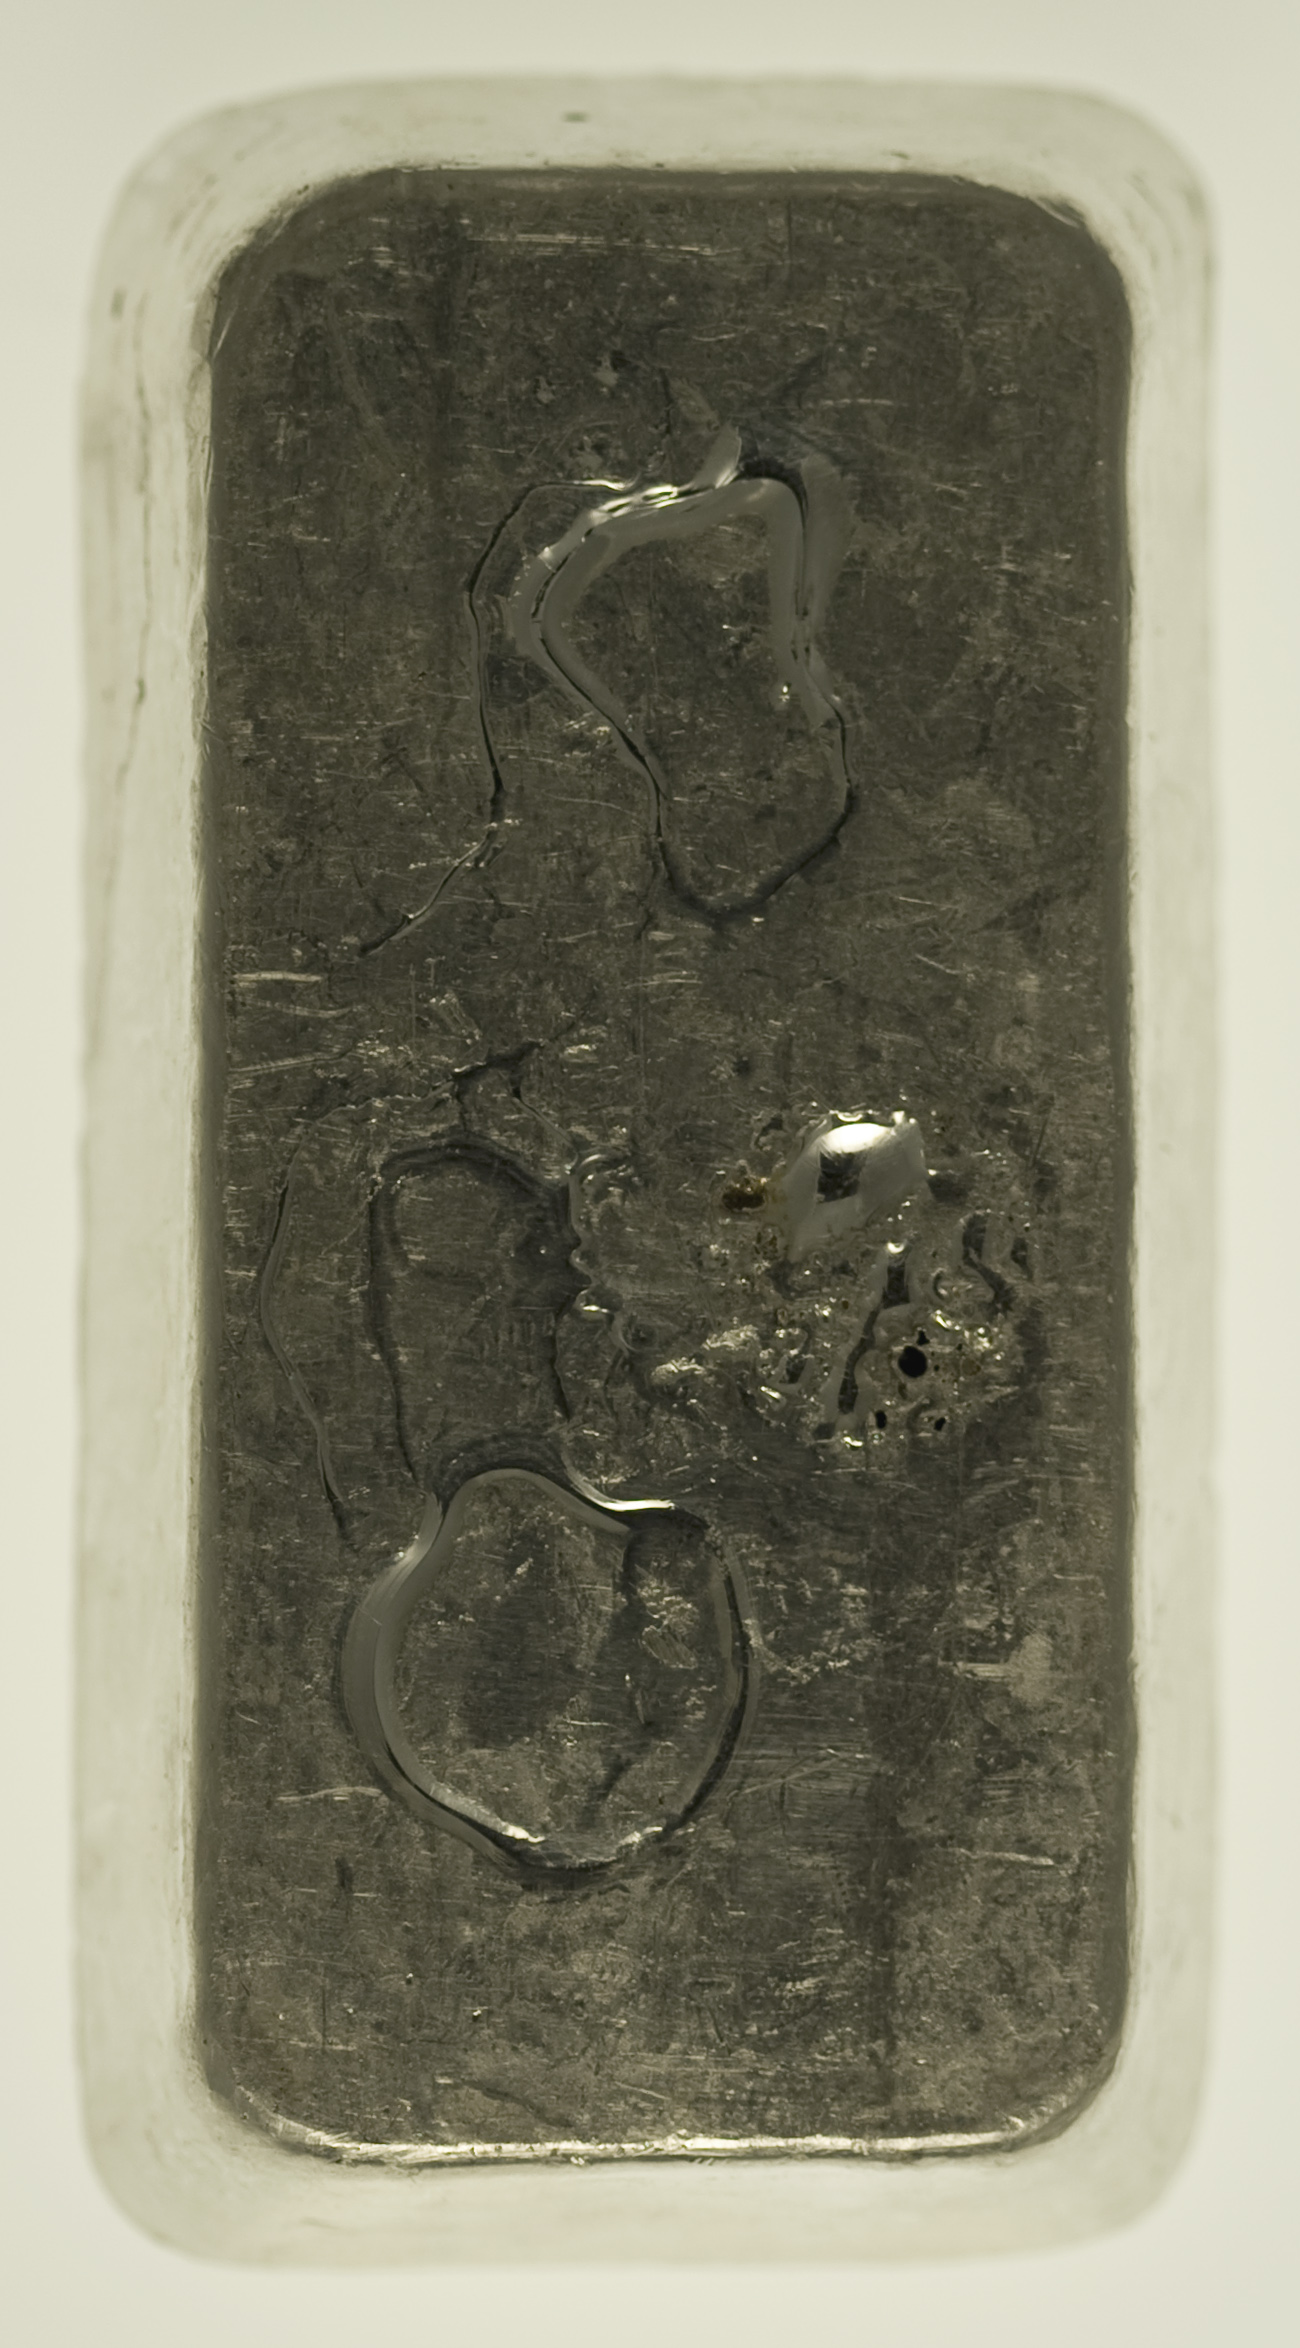 silberbarren - Silberbarren 1 Kilogramm Drijfhout & Zoon NL